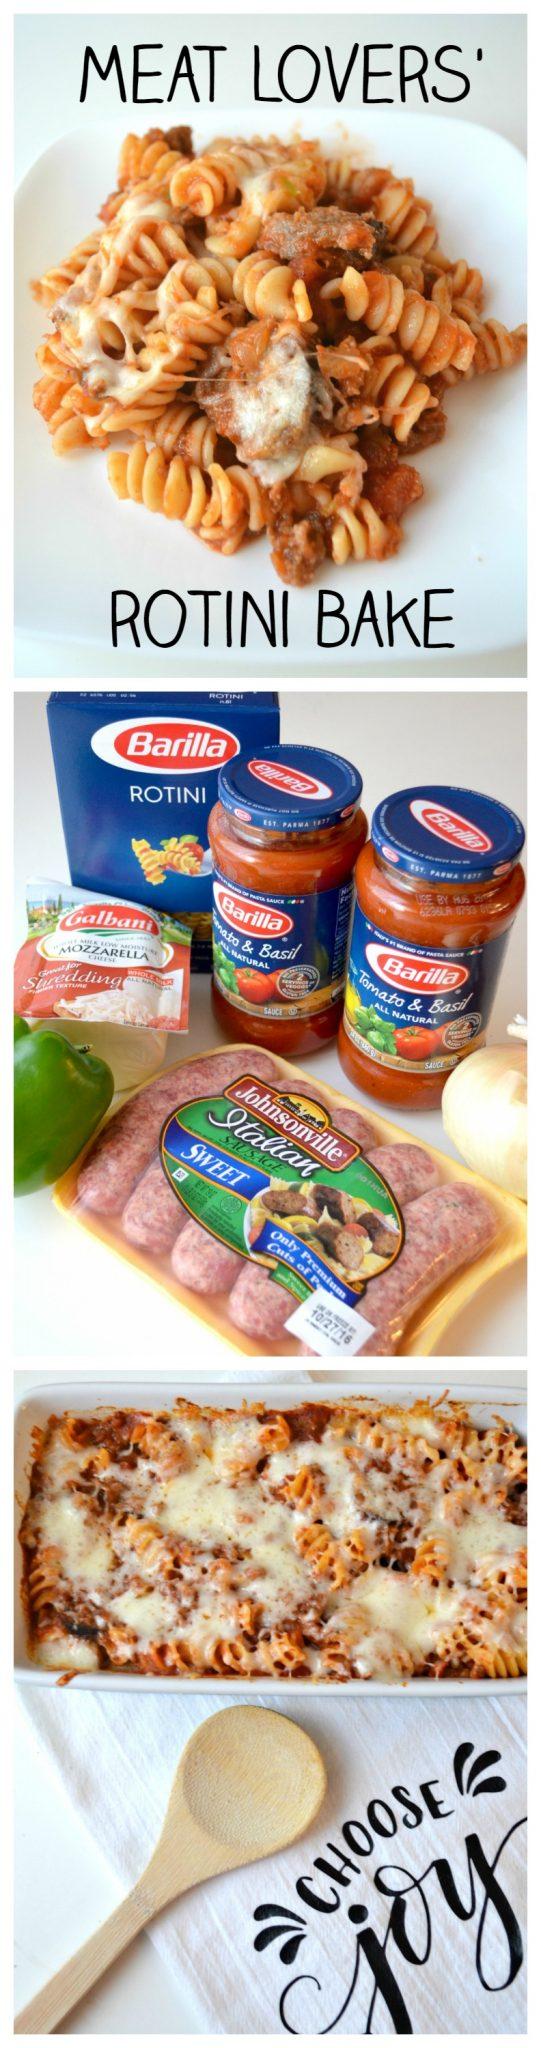 Meat Lovers' Rotini Bake Recipe